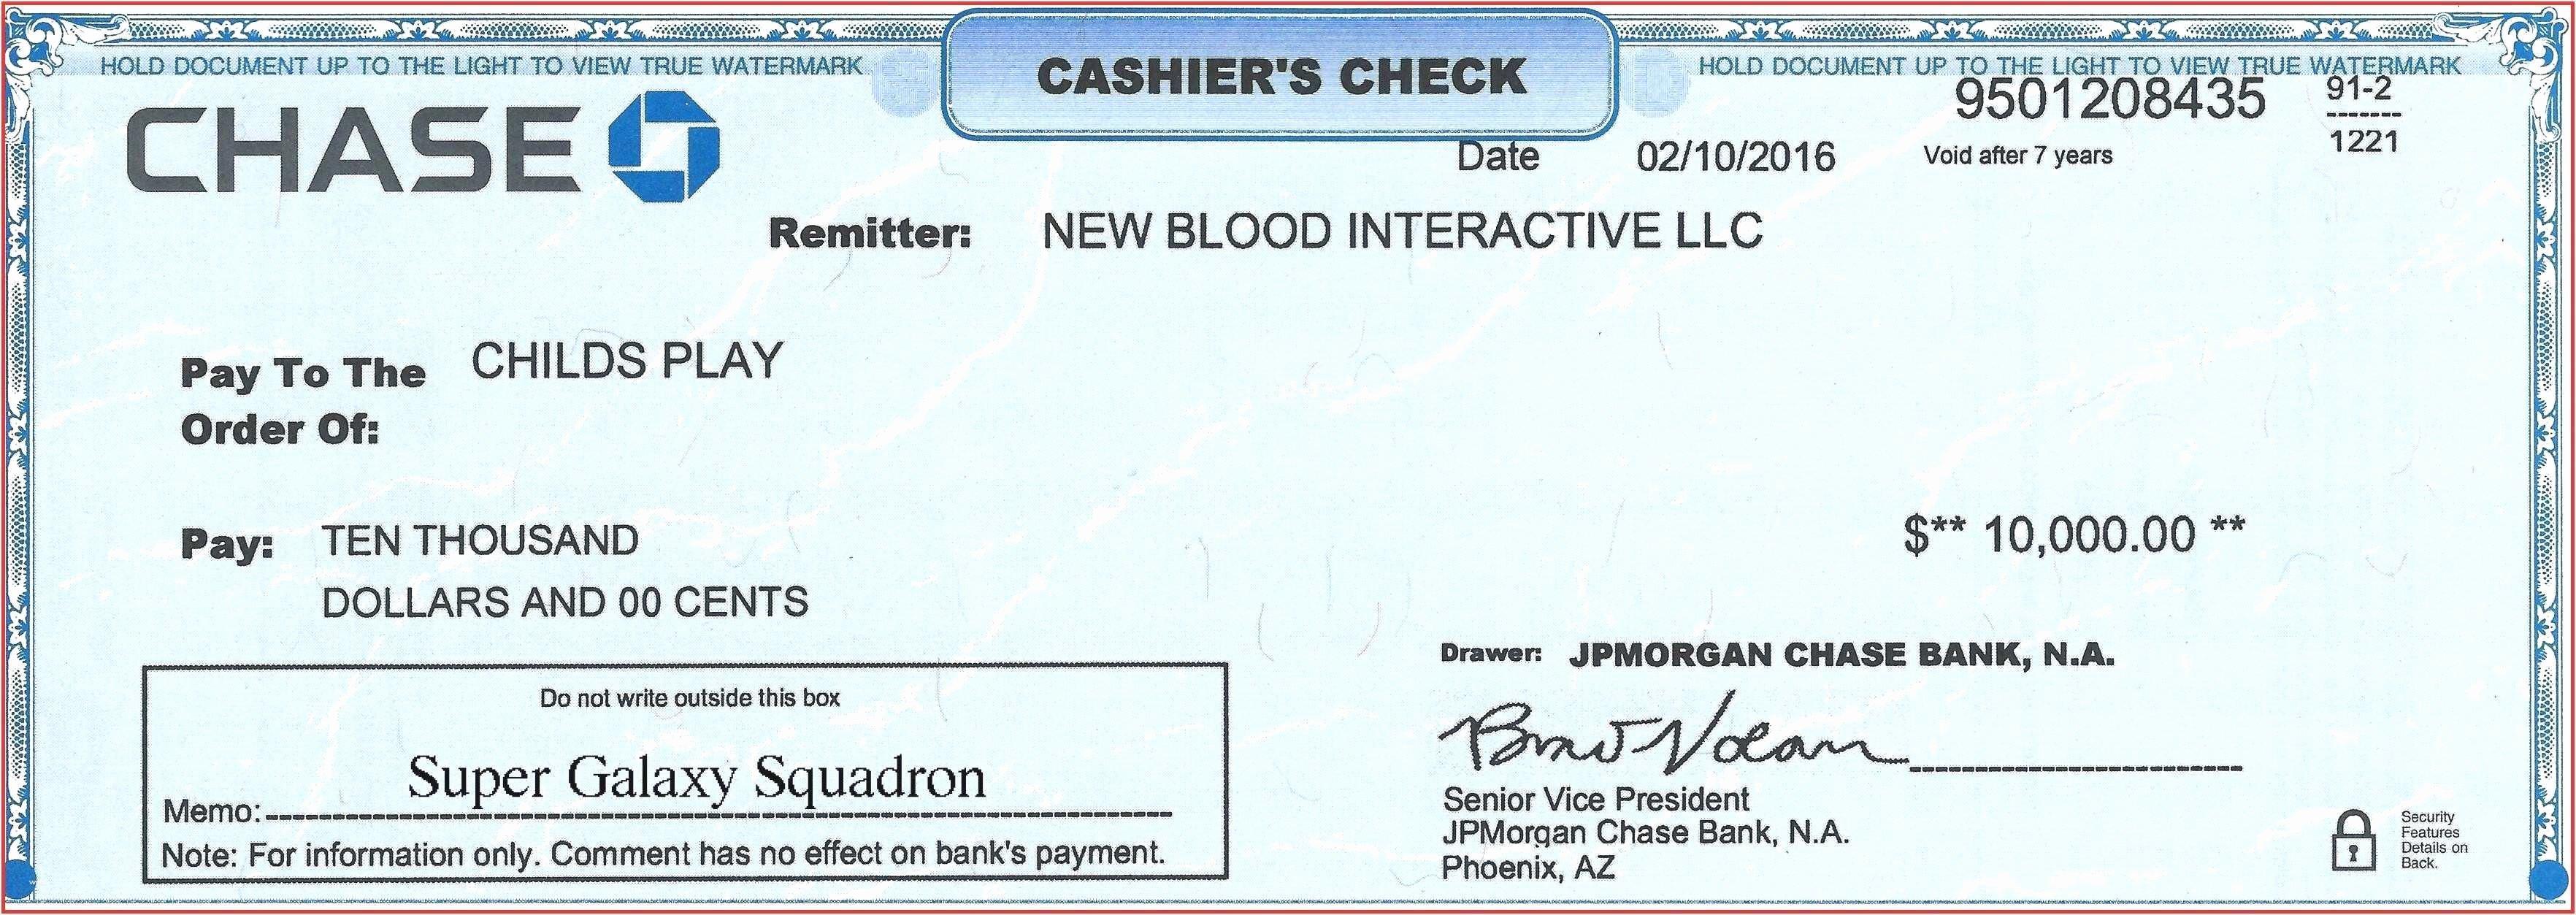 Chase Bank Check Template Inspirational Cashier Check Template Editable Blank Cashiers Pdf Chase